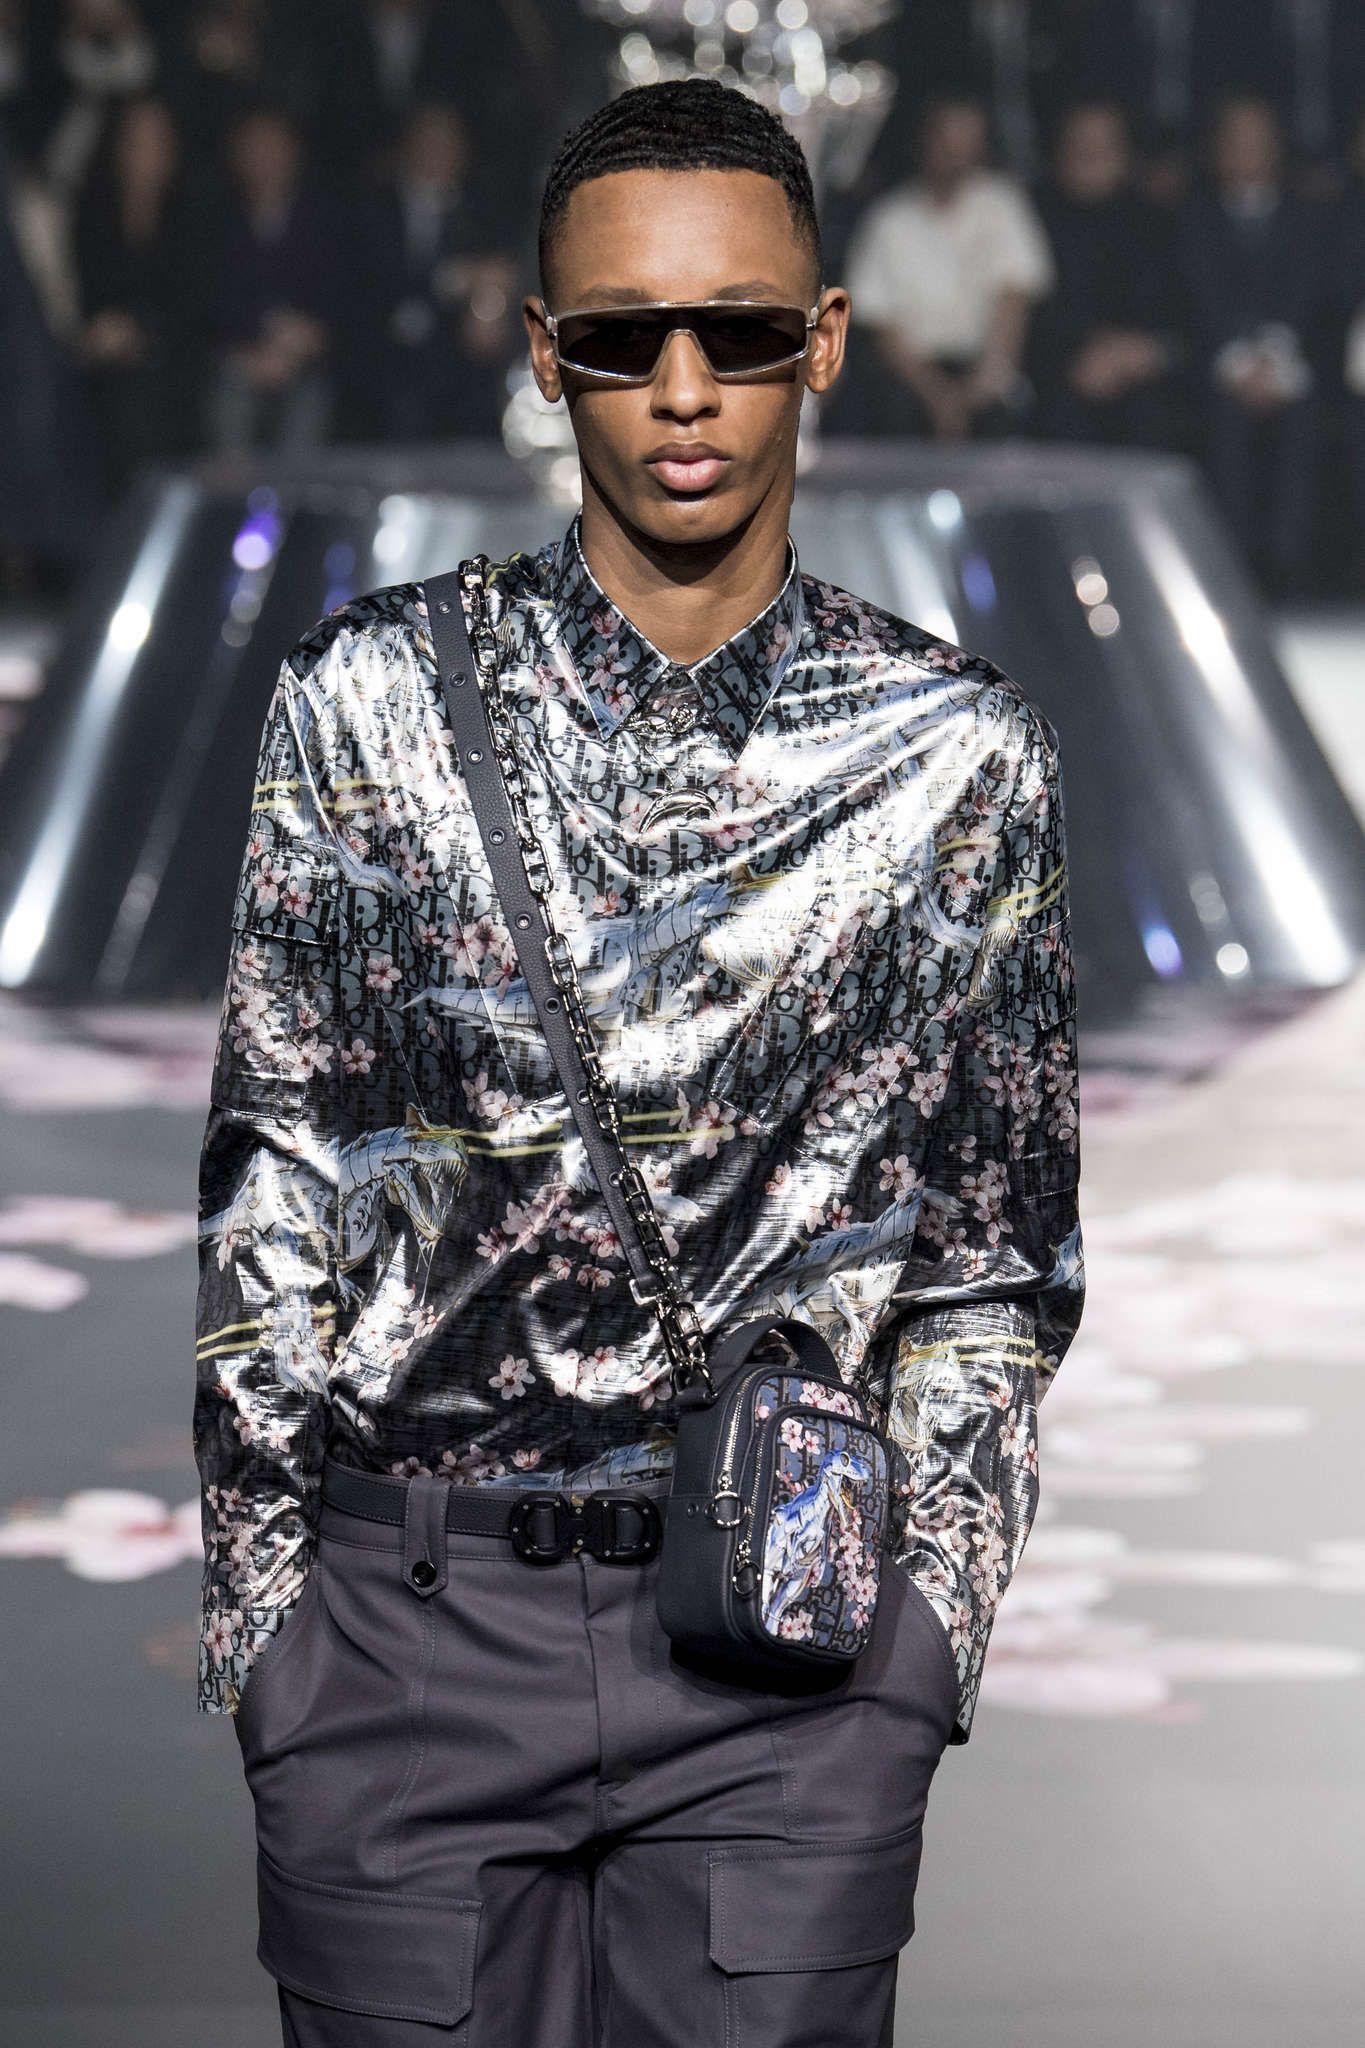 2db40c8cd1c4 Dior Homme pre-fall Fall-Winter 2019